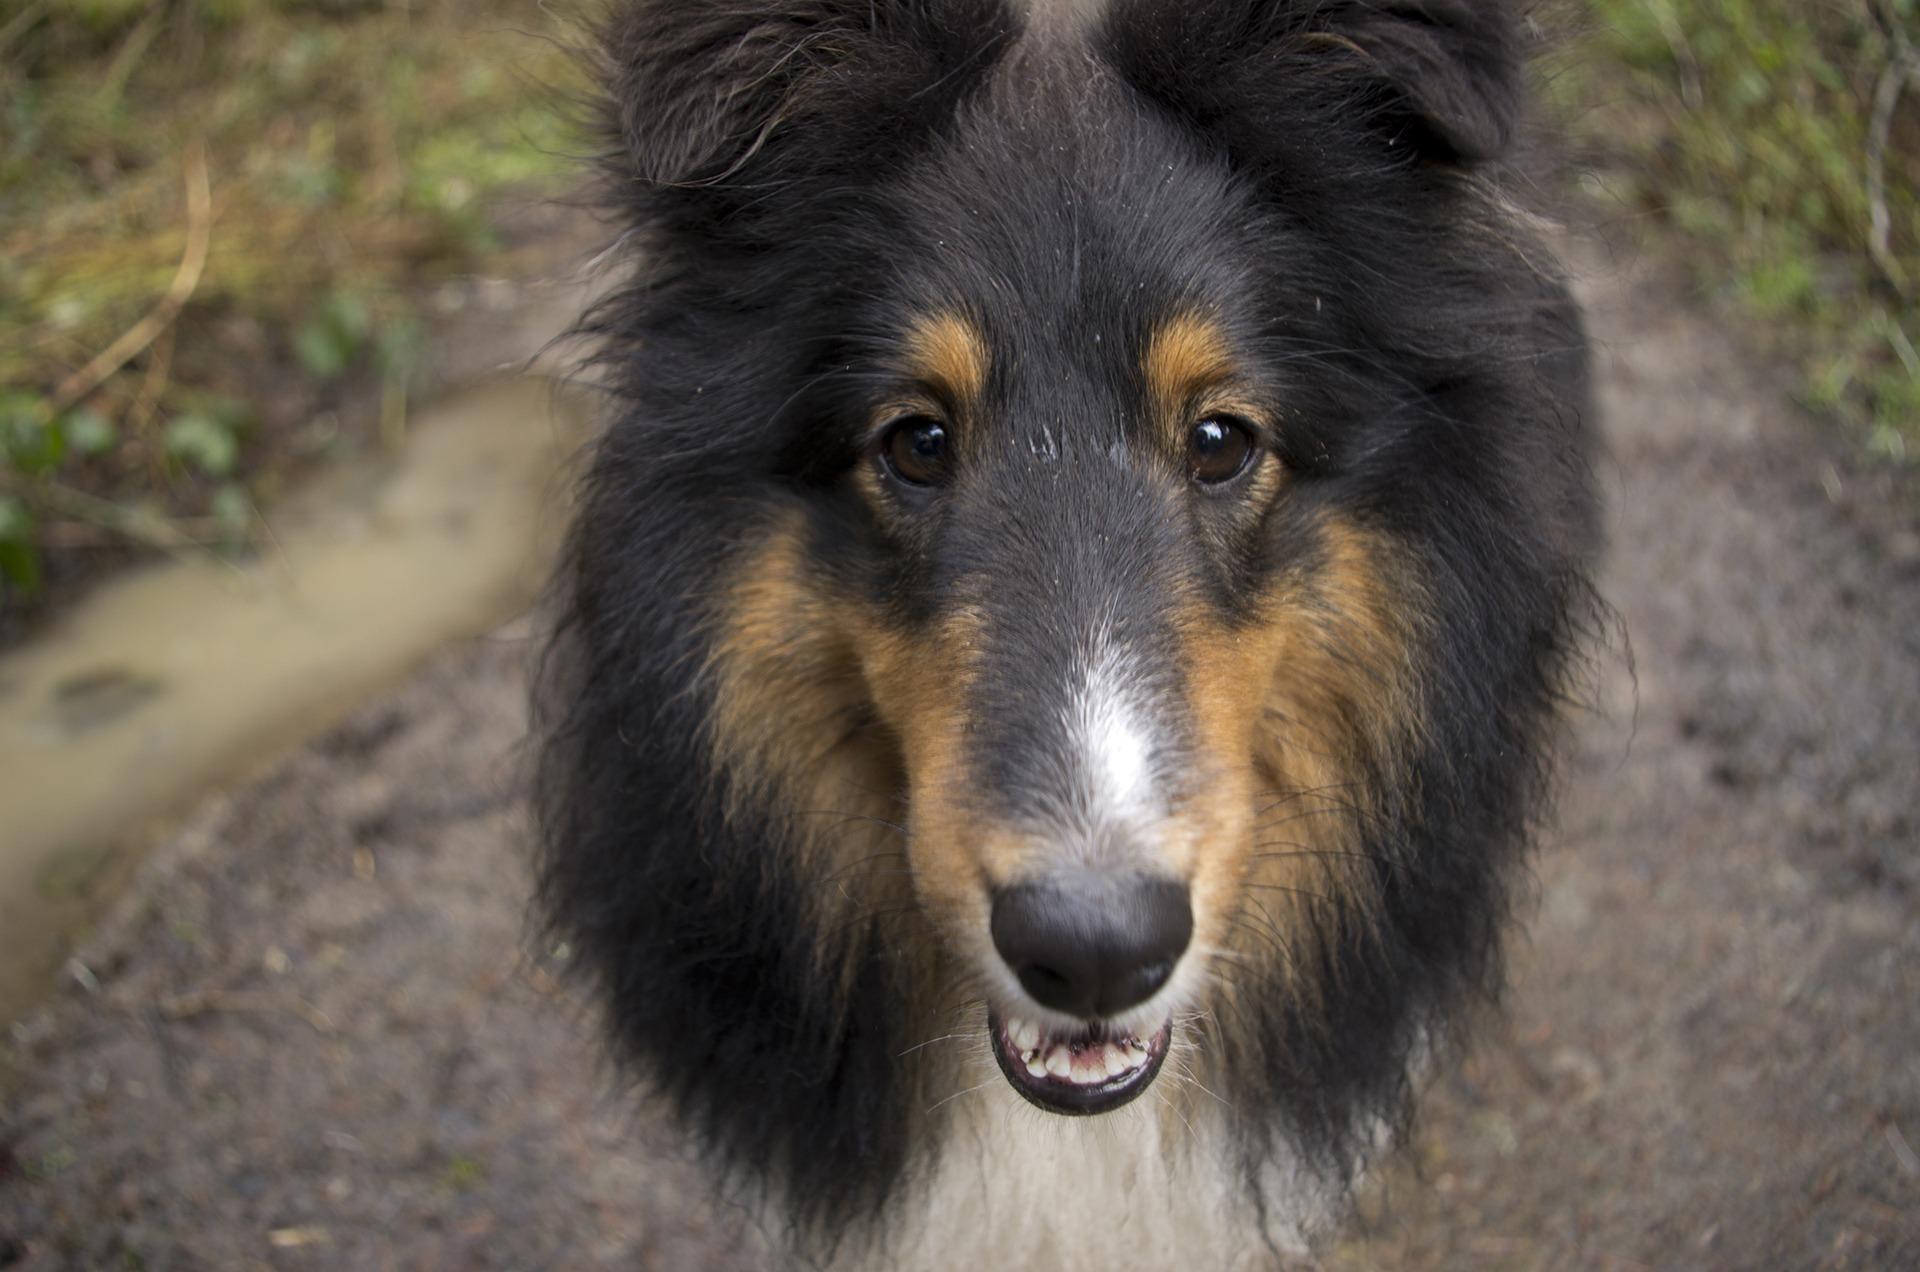 Fantastic Fluffy Canine Adorable Dog - puppy-dog-animal-canine-collie-pet-fur-young-fluffy-mammal-outdoors-face-furry-vertebrate-domestic-adorable-dog-breed-pup-doggy-shetland-sheepdog-dog-like-mammal-carnivoran-dog-breed-group-rough-collie-bohemian-shepherd-tervuren-scotch-collie-1246289  2018_155028  .jpg